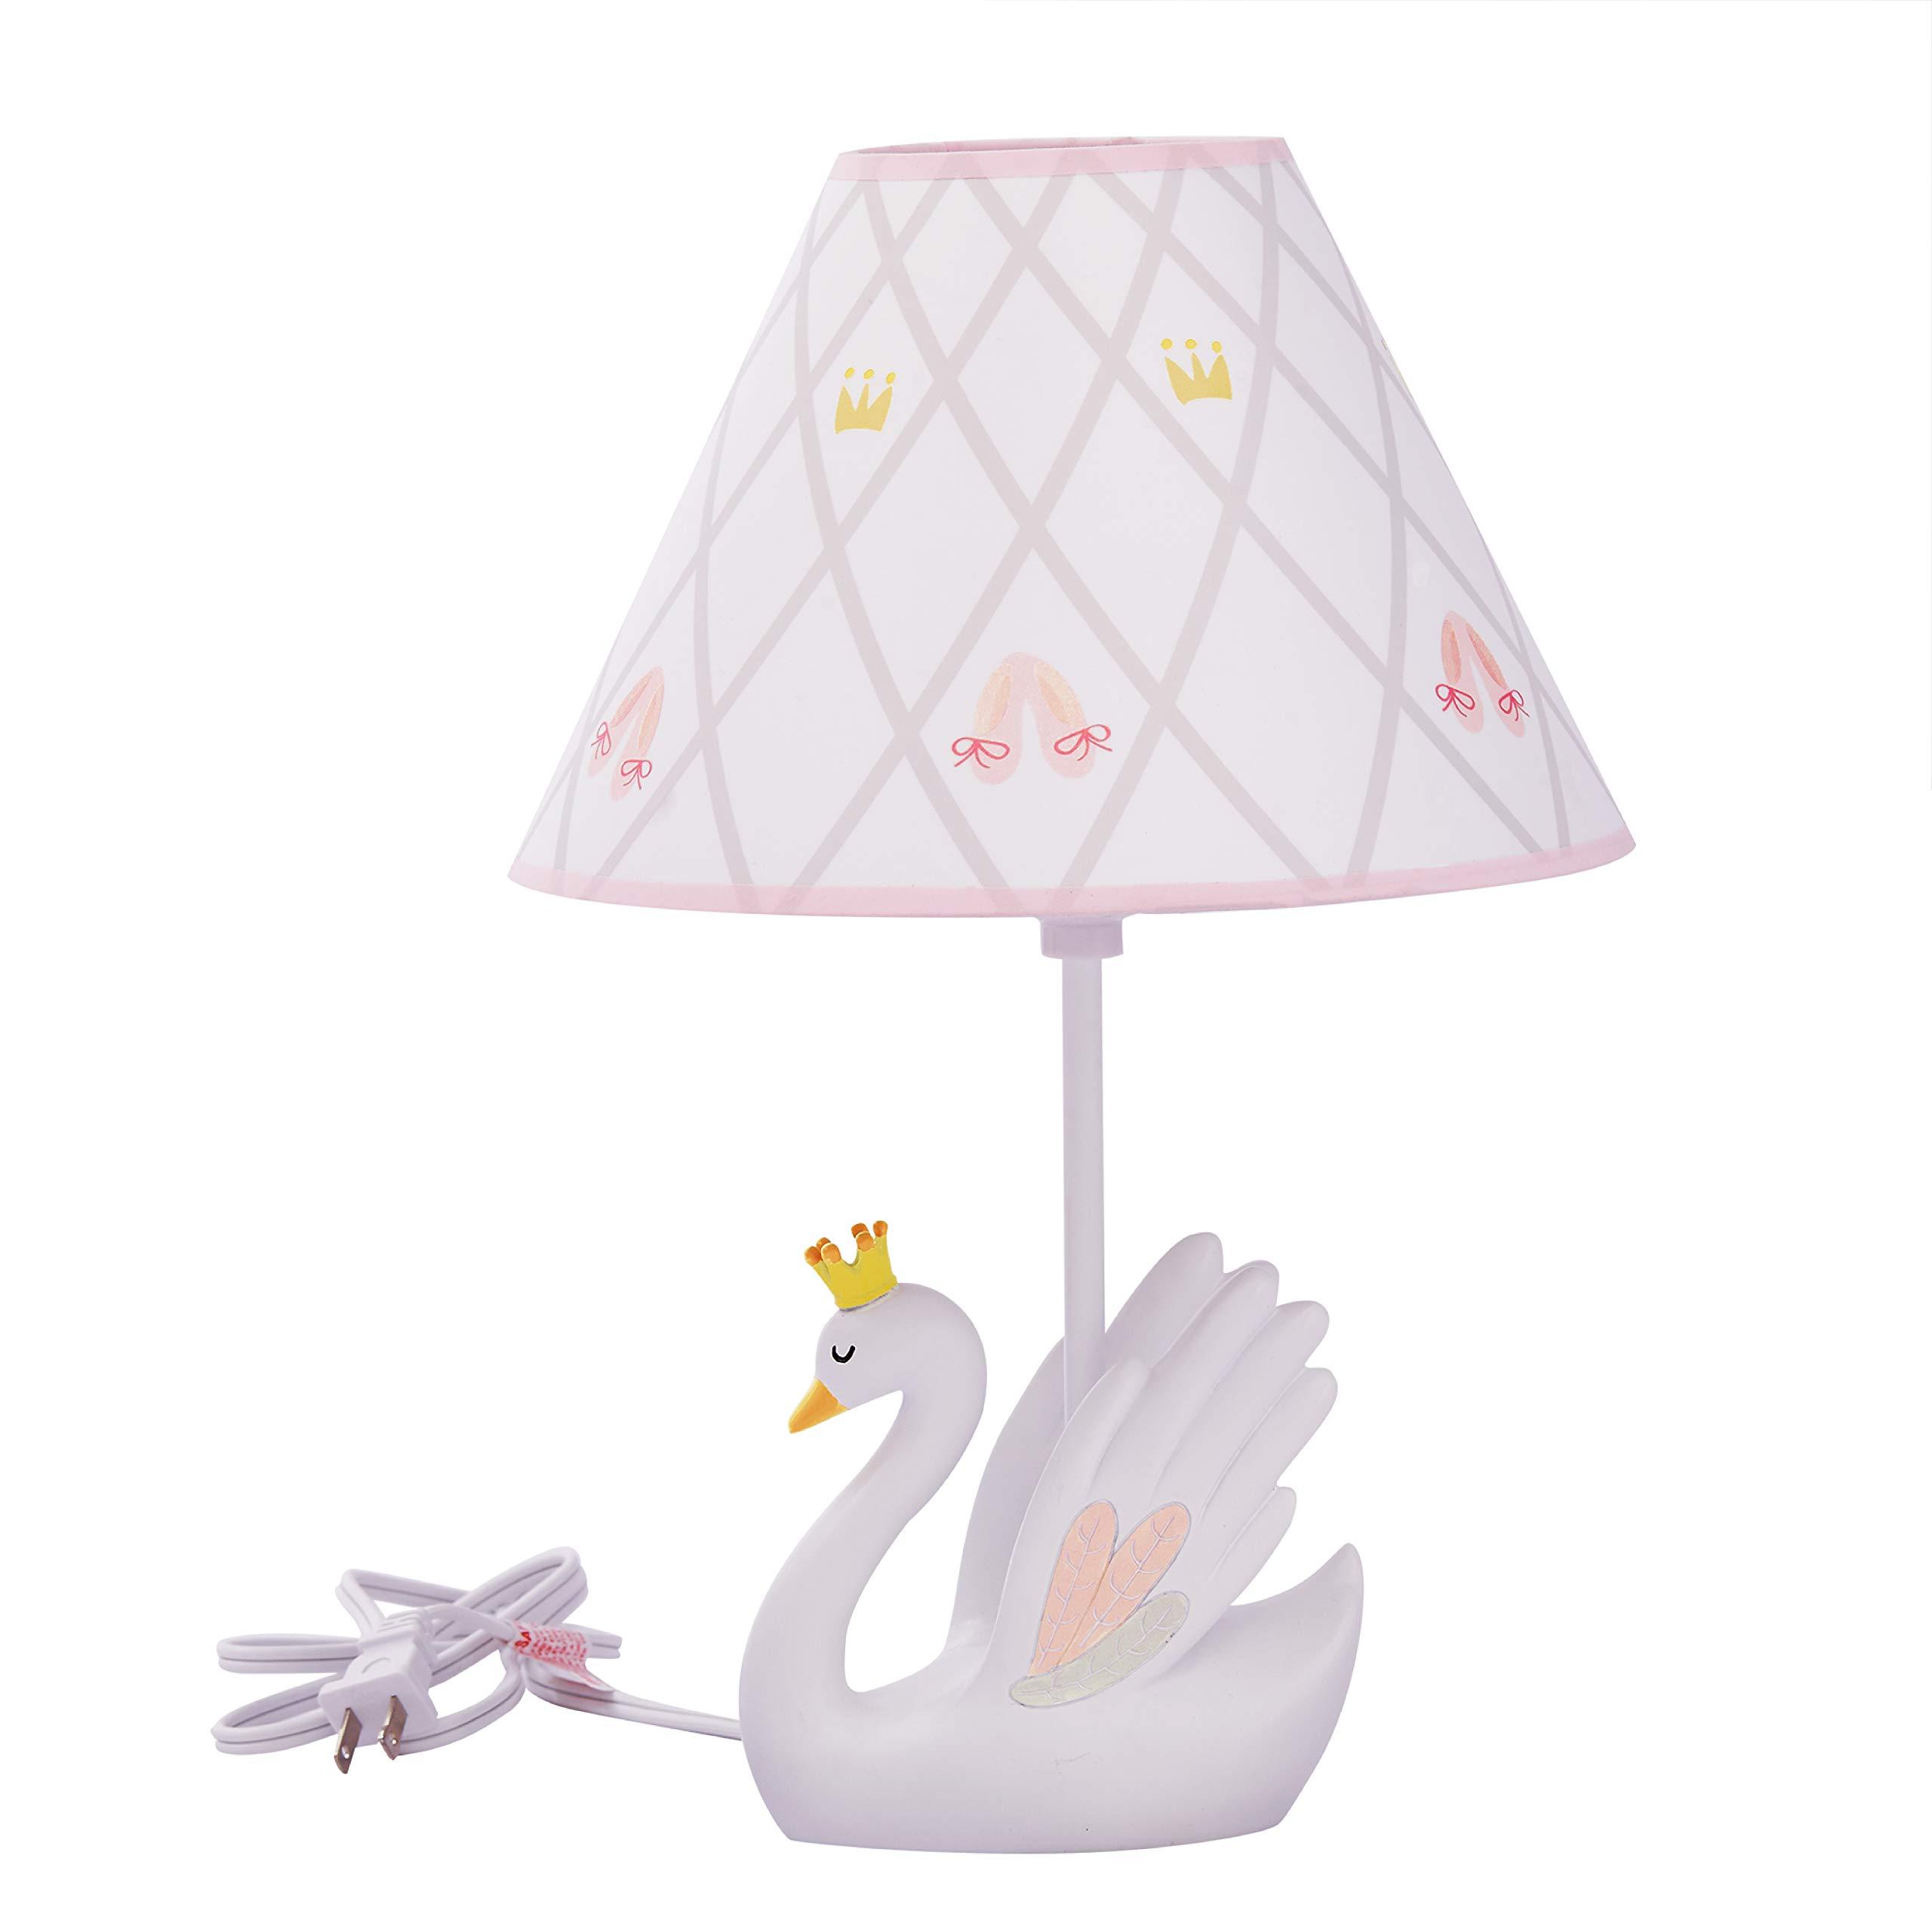 Fantasy Fields - Swan Lake Table Lamp | Kids Bedroom Night Light | Thematic Kids Table Lamp